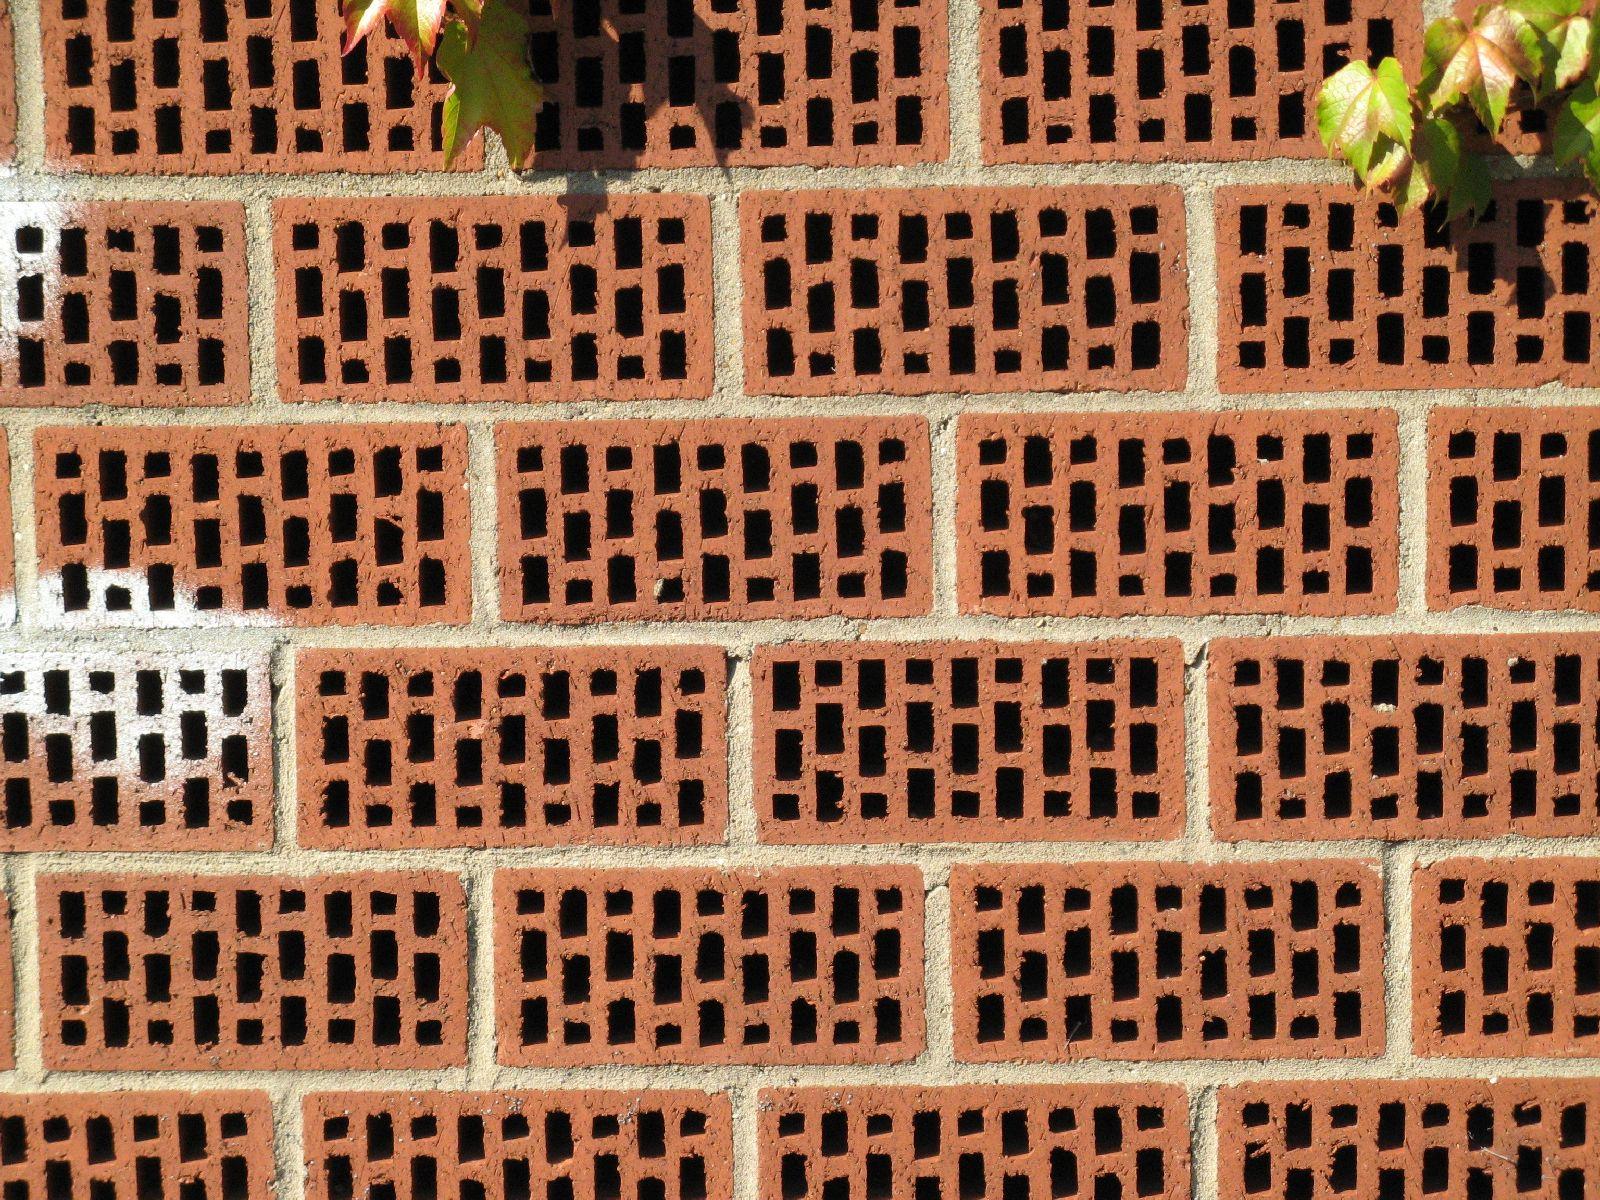 Brick_Texture_B_1161